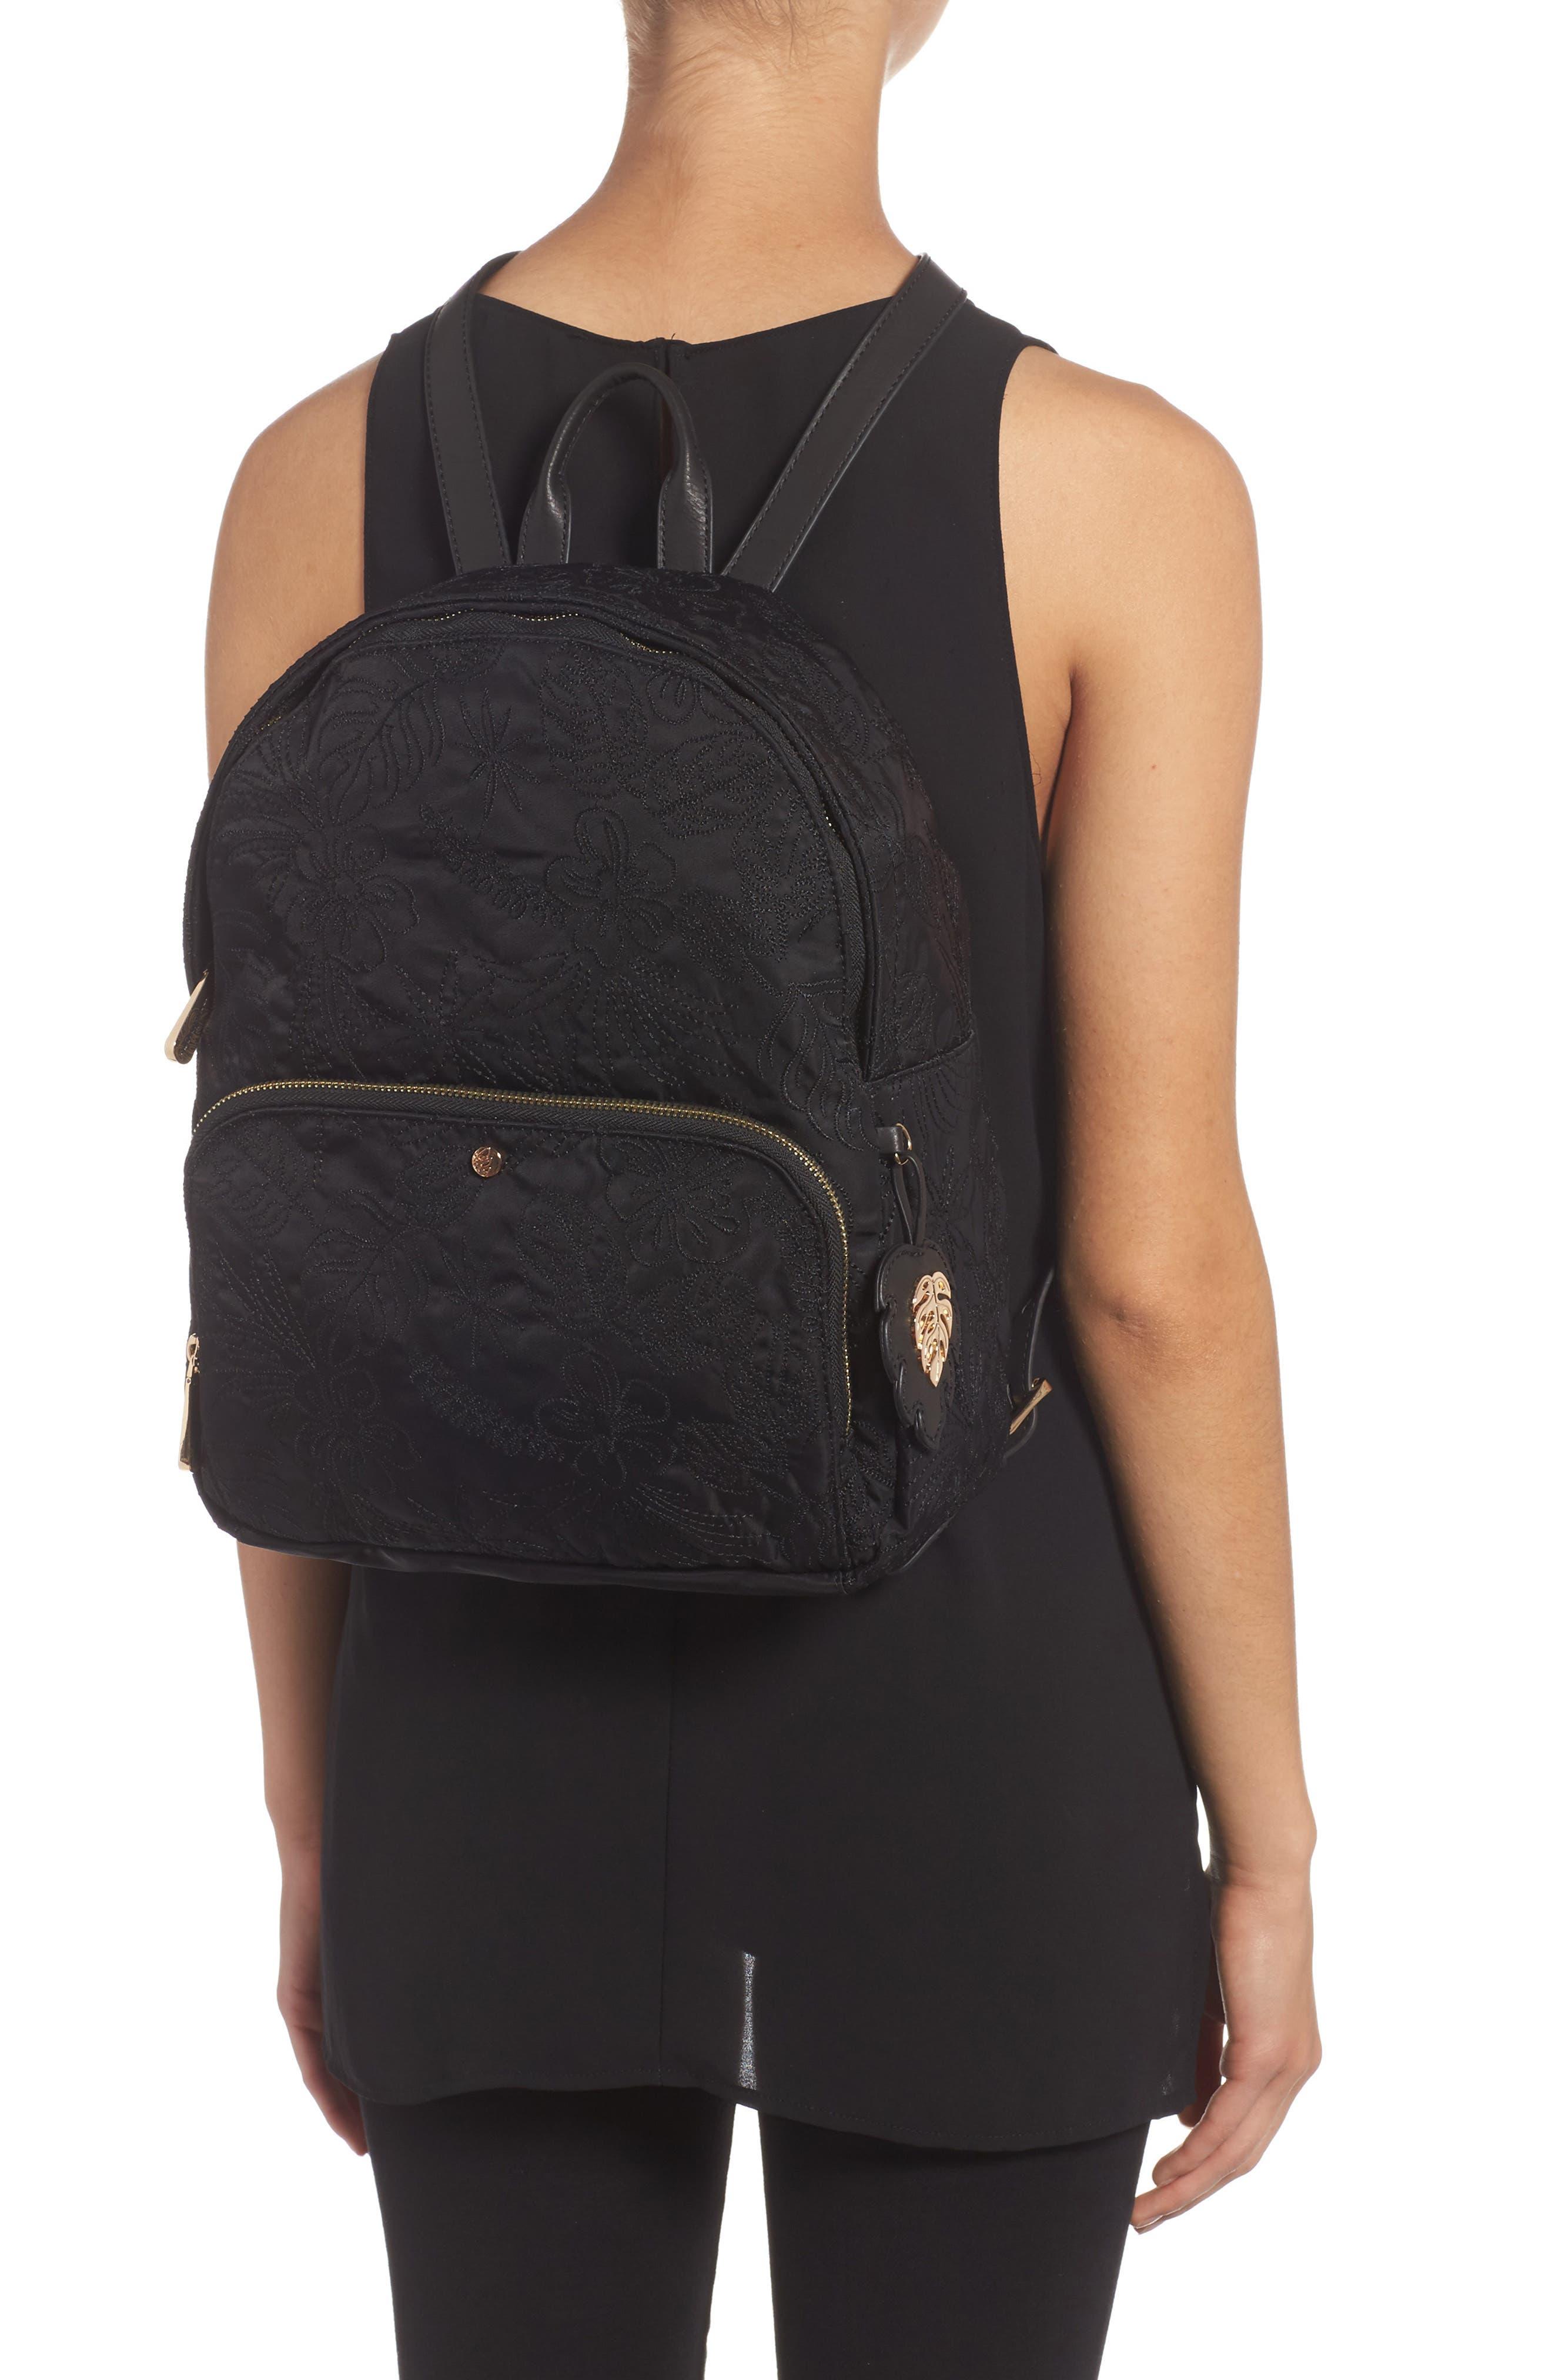 Siesta Key Backpack,                             Alternate thumbnail 19, color,